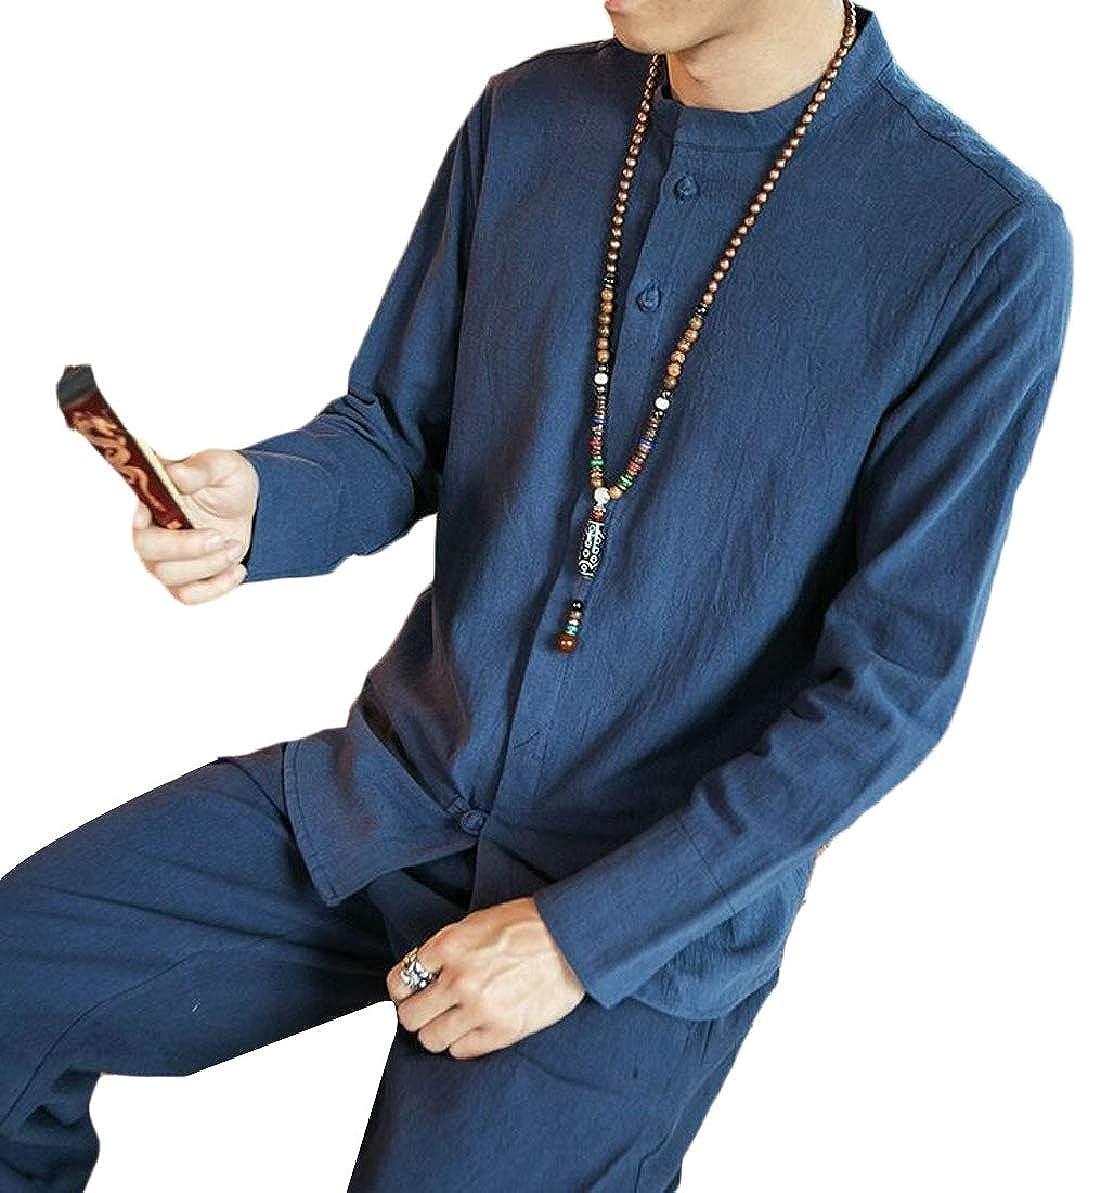 FLCH+YIGE Mens Cotton Linen Chinese Style Fashion Long Sleeve Shirt